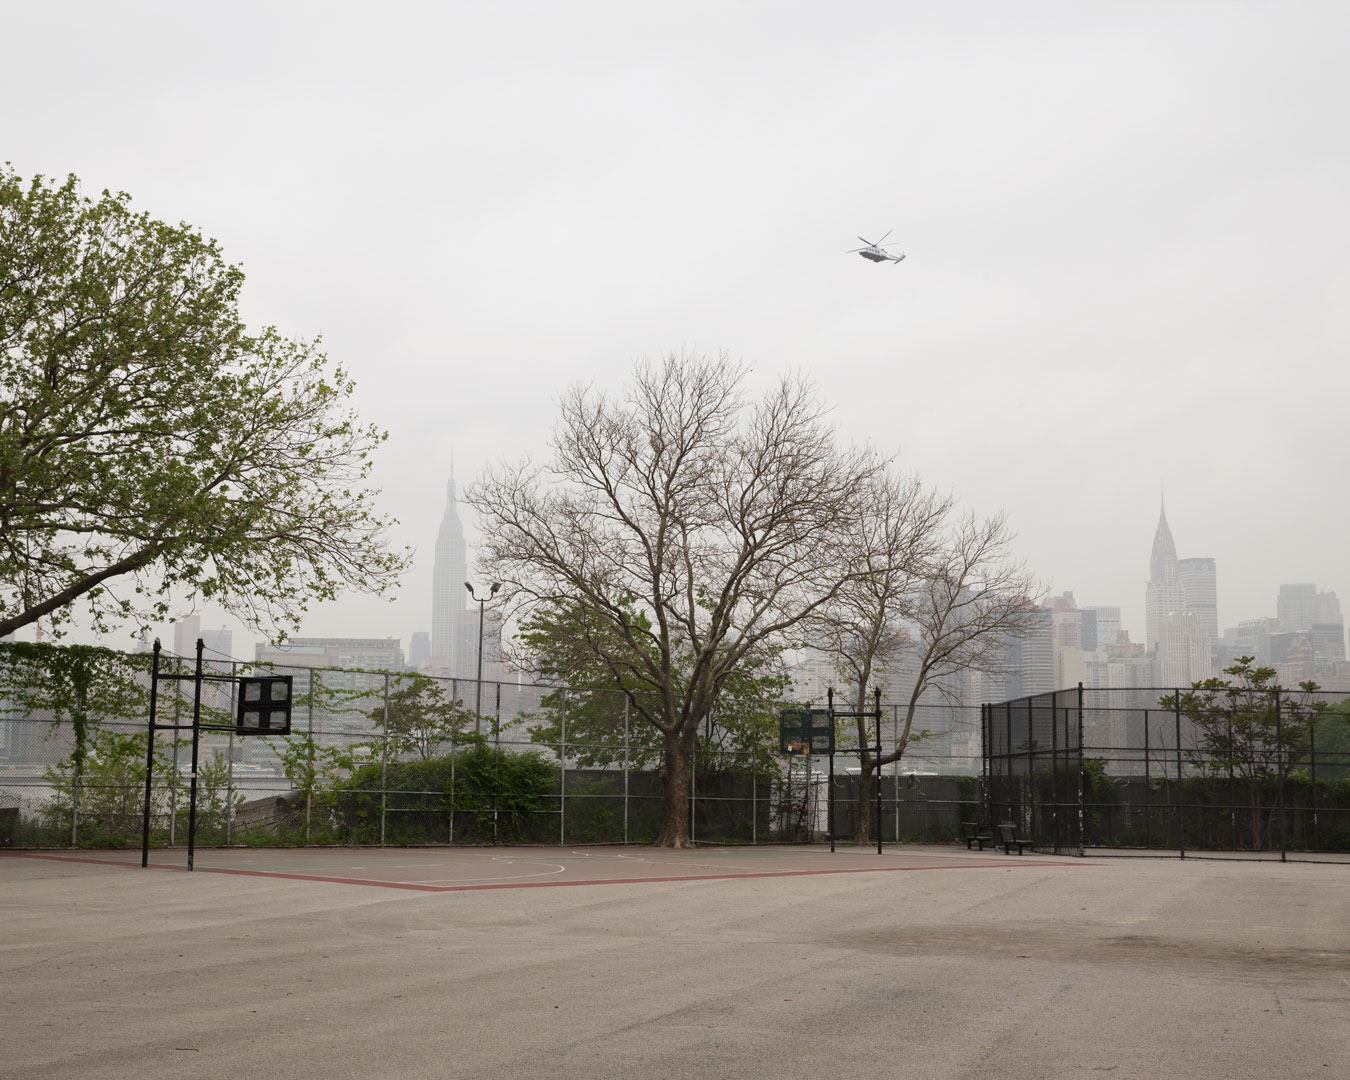 new-york-urban-basketball-coart-with-helicopter-overhead